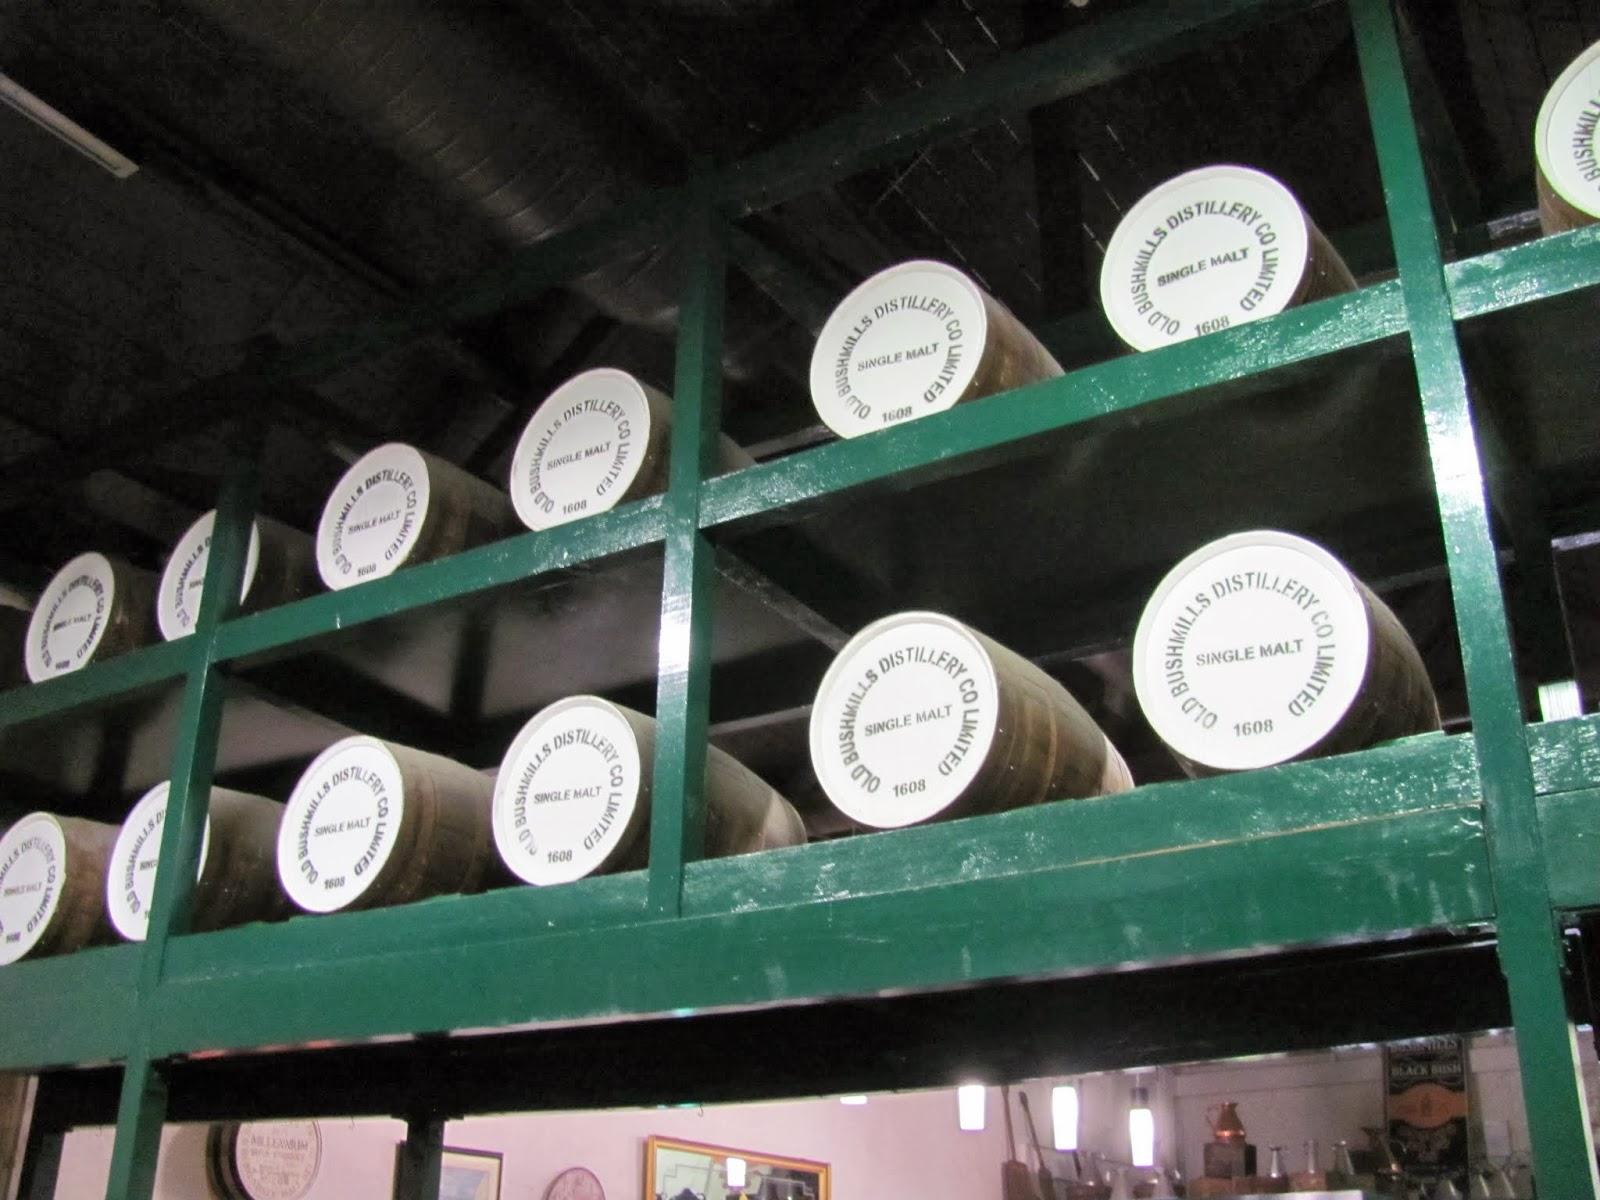 Barrels of Bushmills' Whiskey aging in Bushmills, Northern Ireland, UK